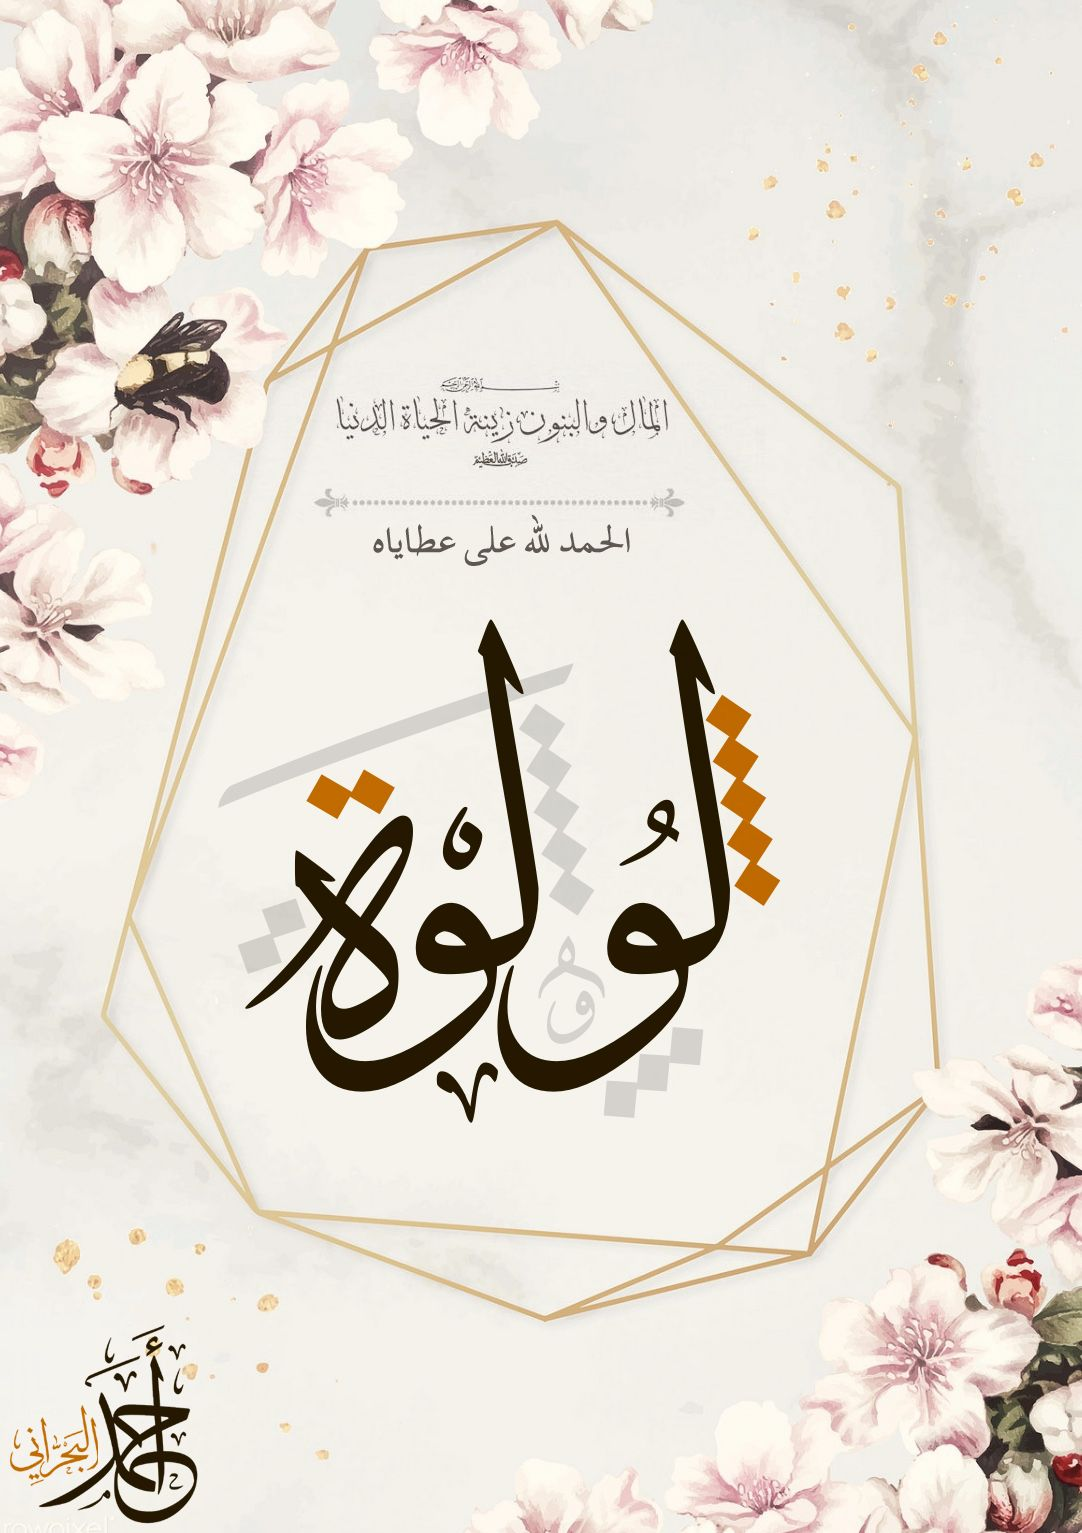 Islamic Calligraphy لولوة Lulwa Name أسم اسم خط تهنئة مولودة Flower Phone Wallpaper Phone Wallpaper Invitations